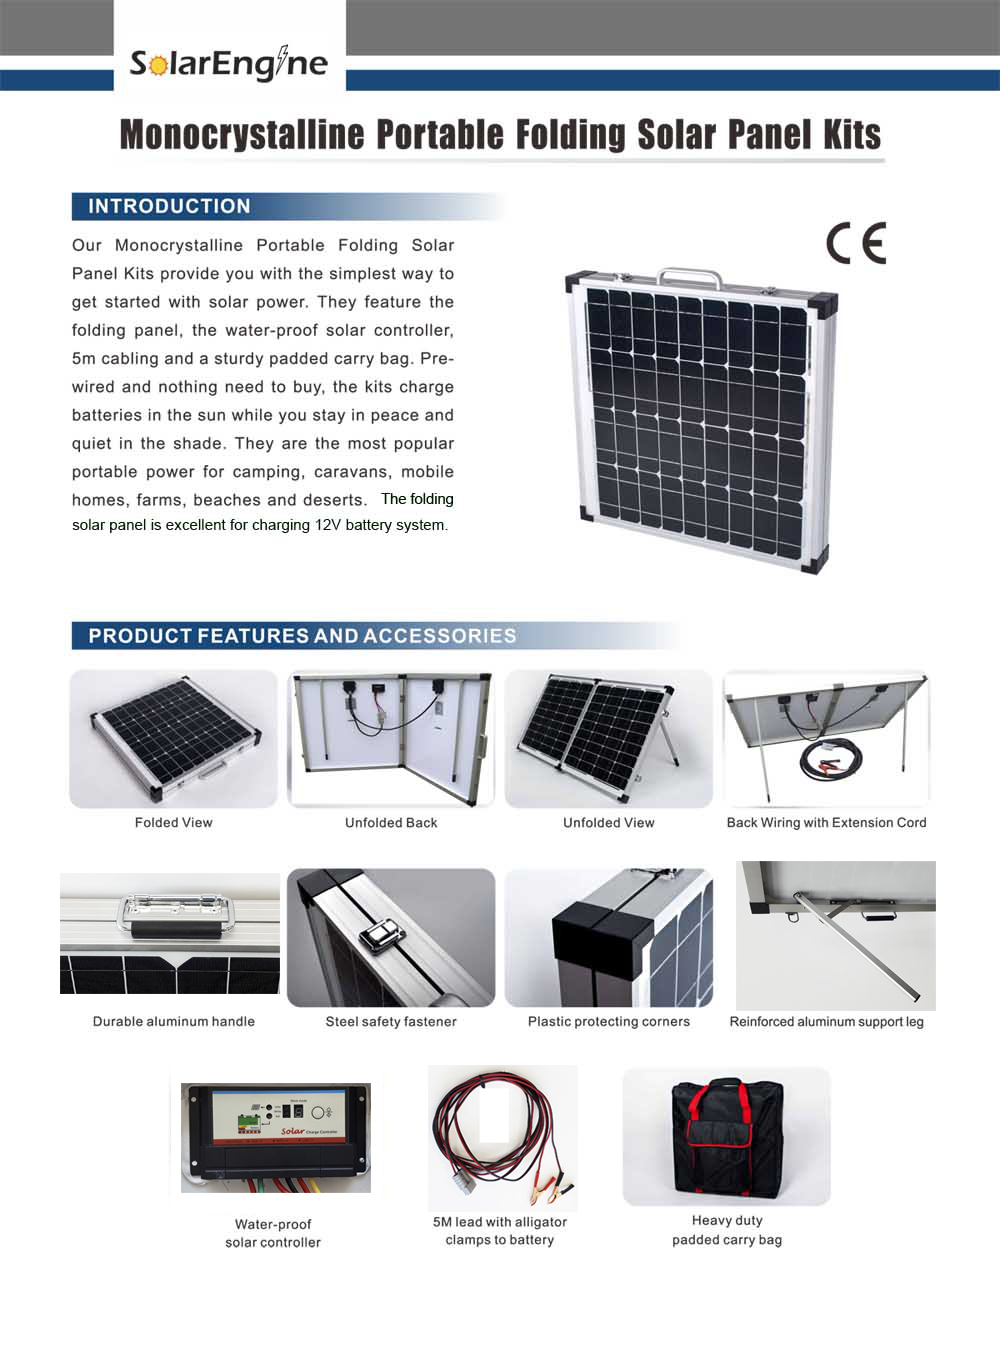 Folding_solar_panel_kit.jpg